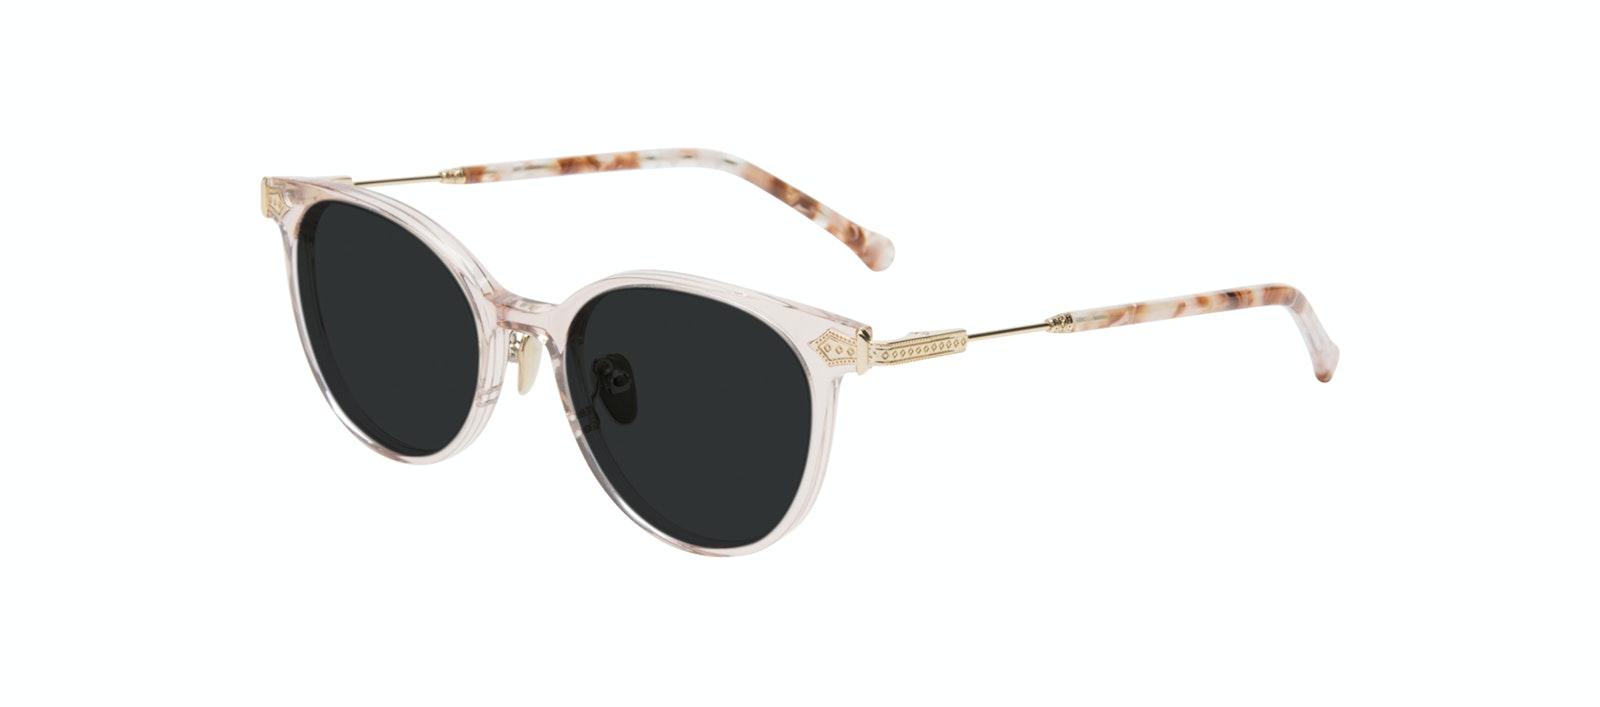 Affordable Fashion Glasses Round Sunglasses Women Gem Pink Quartz Tilt